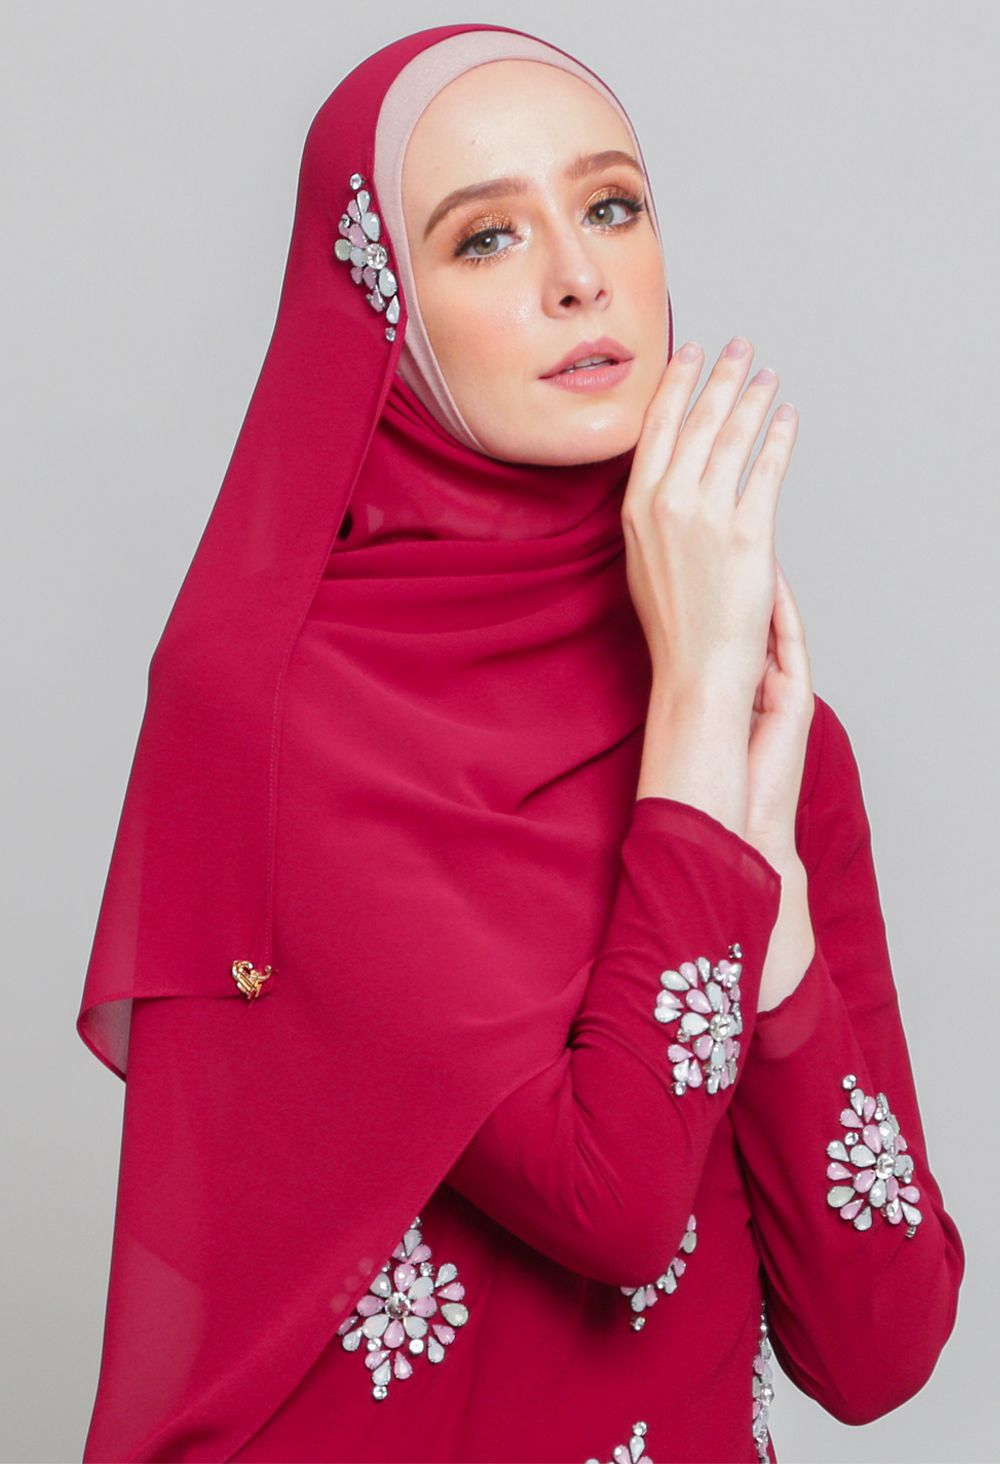 Warna Jilbab Untuk Baju Merah Hati